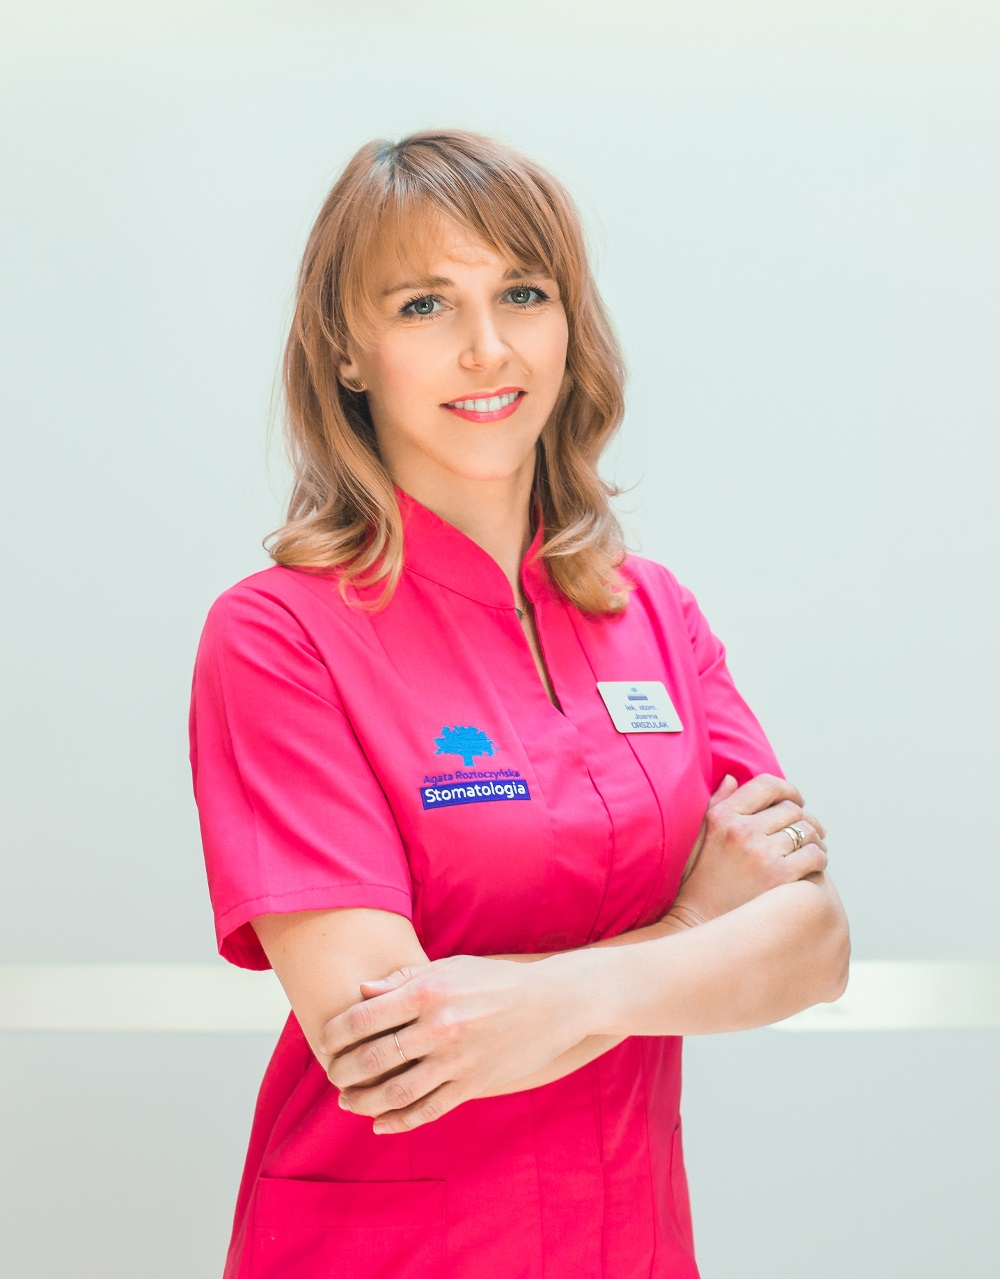 2. Joanna Orszulak, lekarz stomatolog